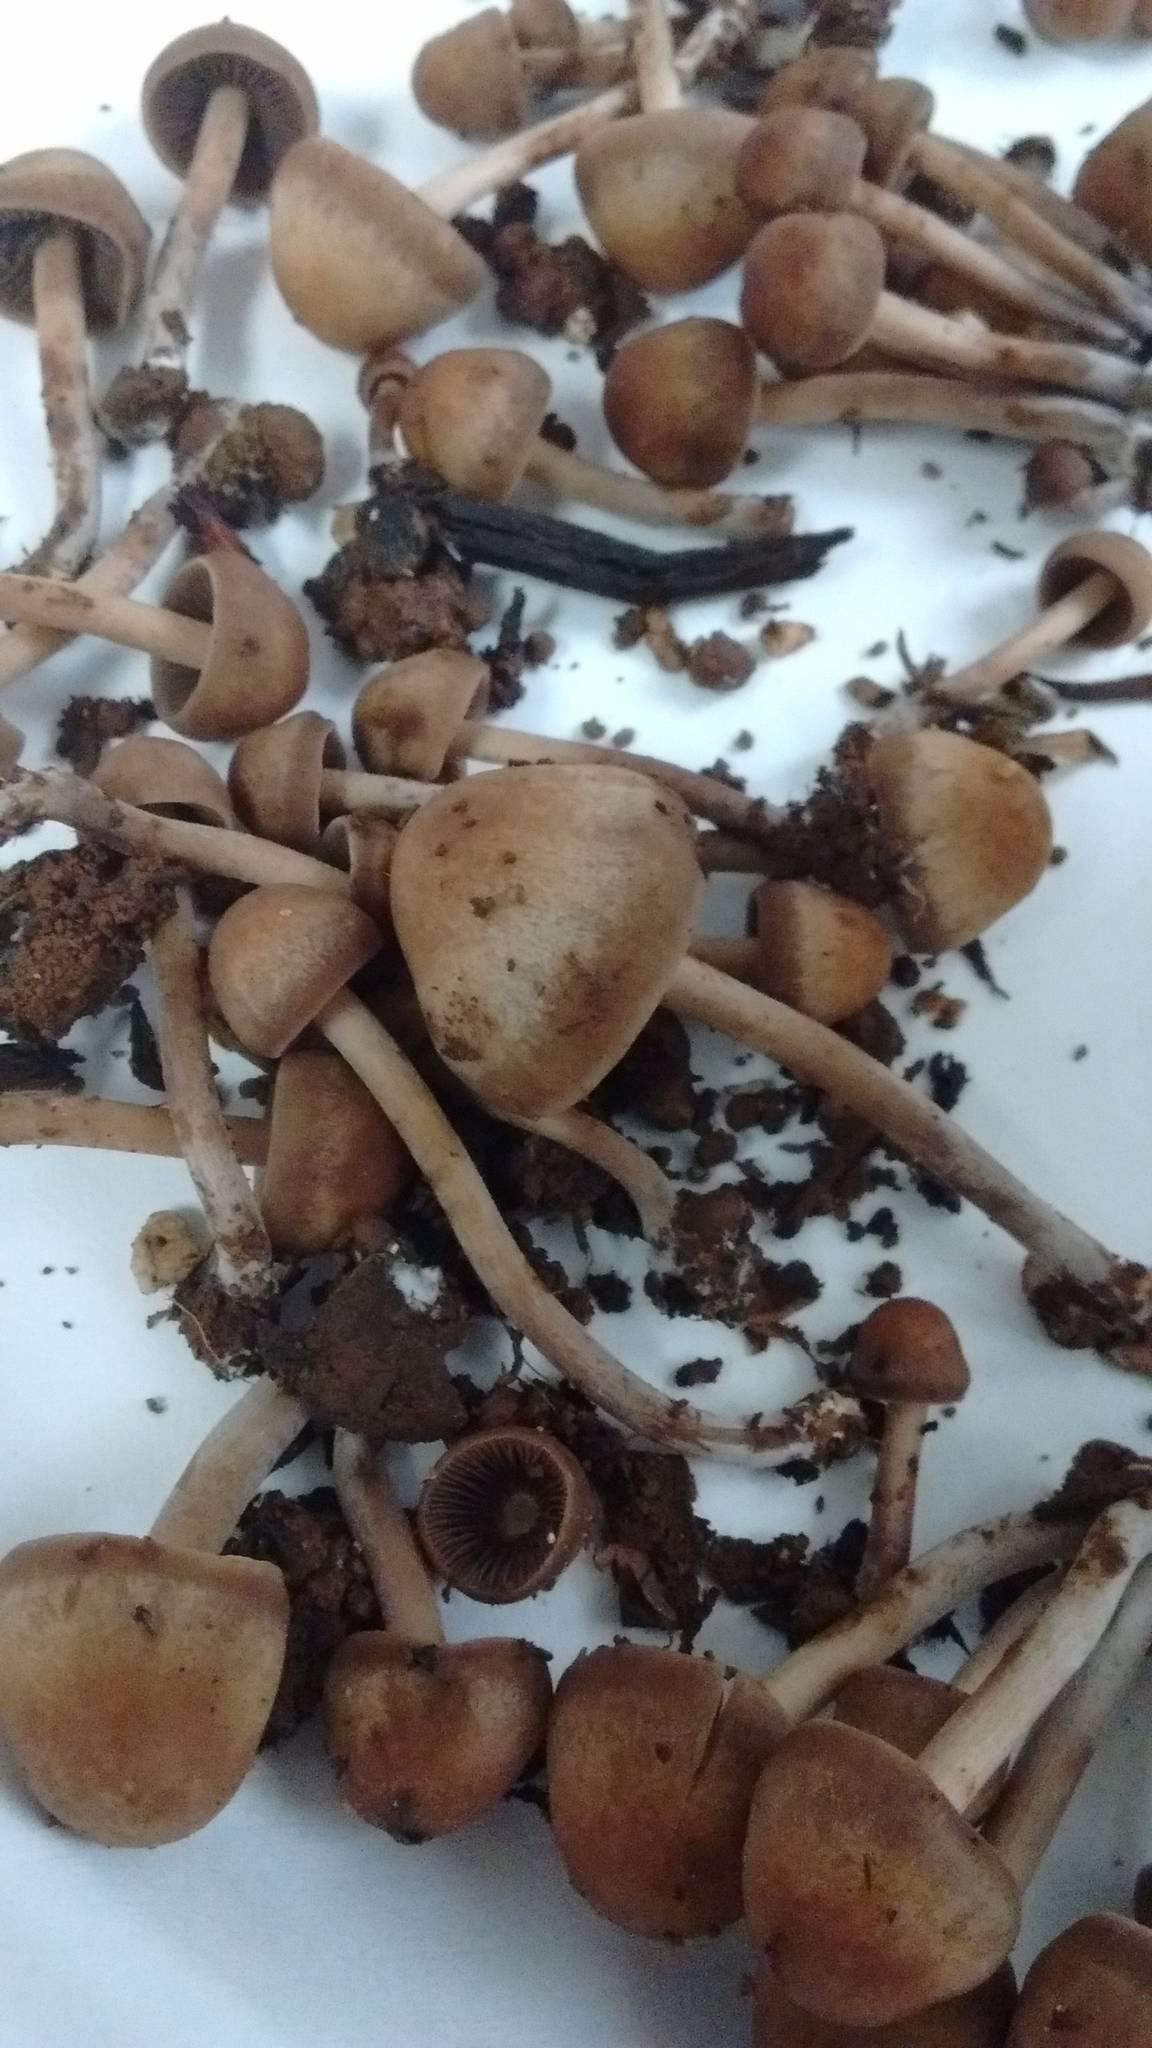 need help identify!! - Mushroom Hunting and Identification